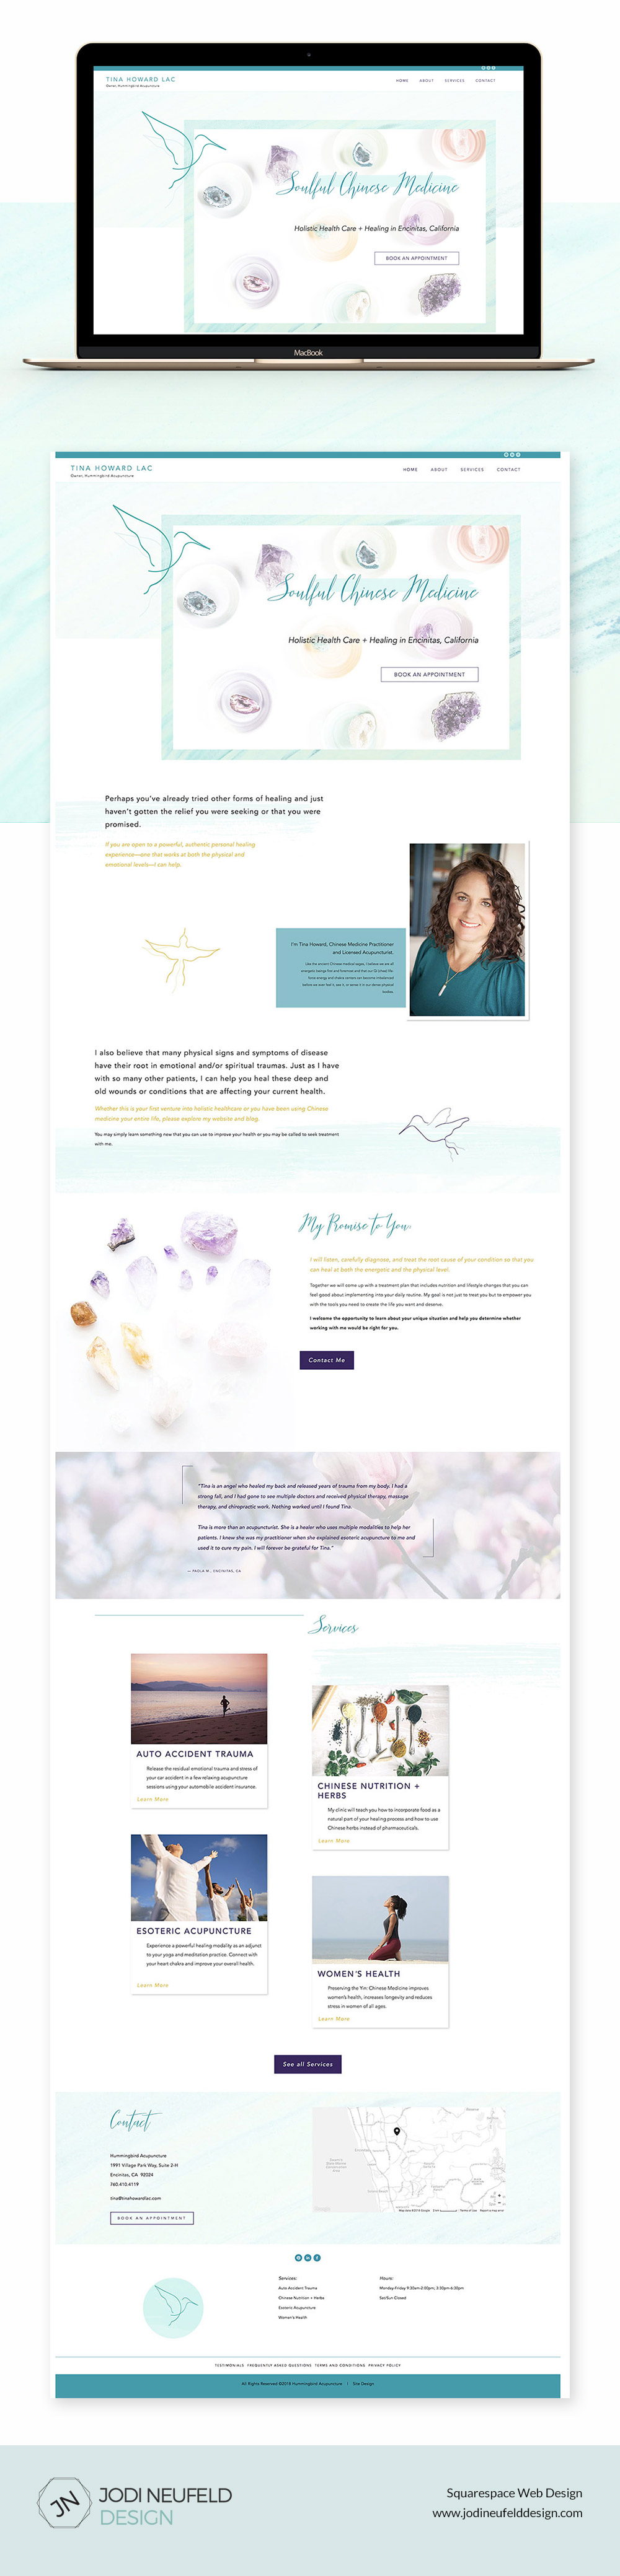 Tina Howard home page website design   Squarespace website design by Jodi Neufeld Design